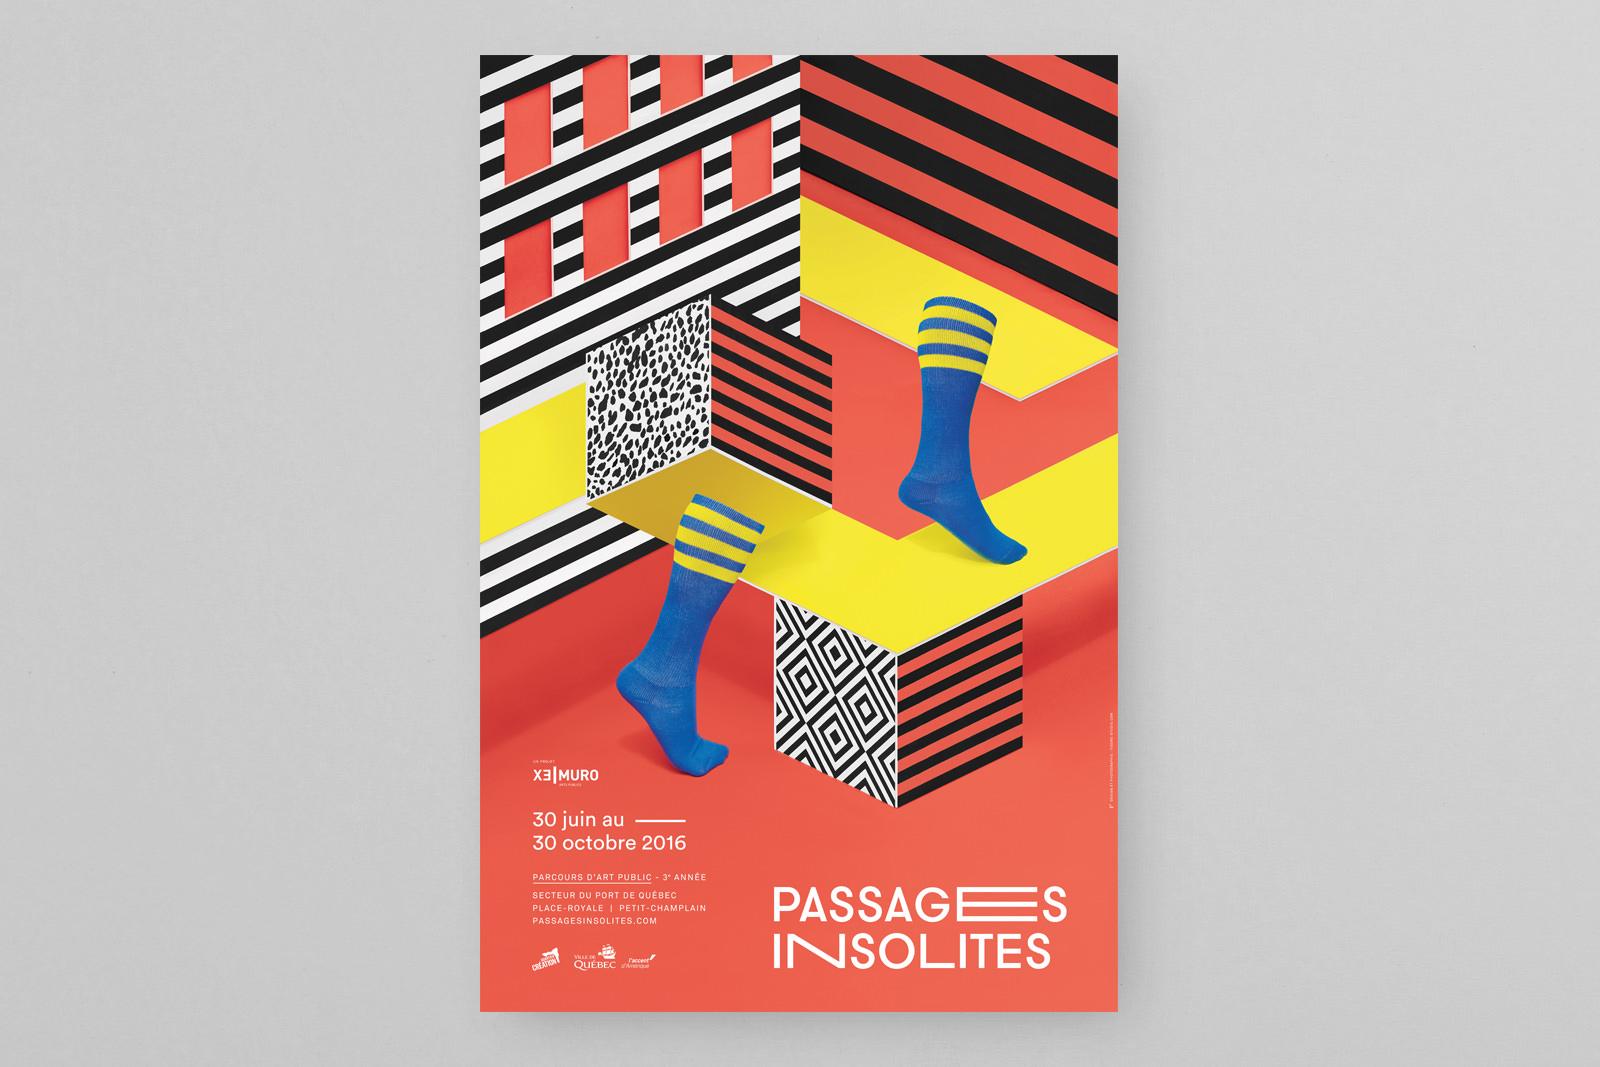 PassagesInsolites-JeremyHall-Figure-ExMuro-1.jpg